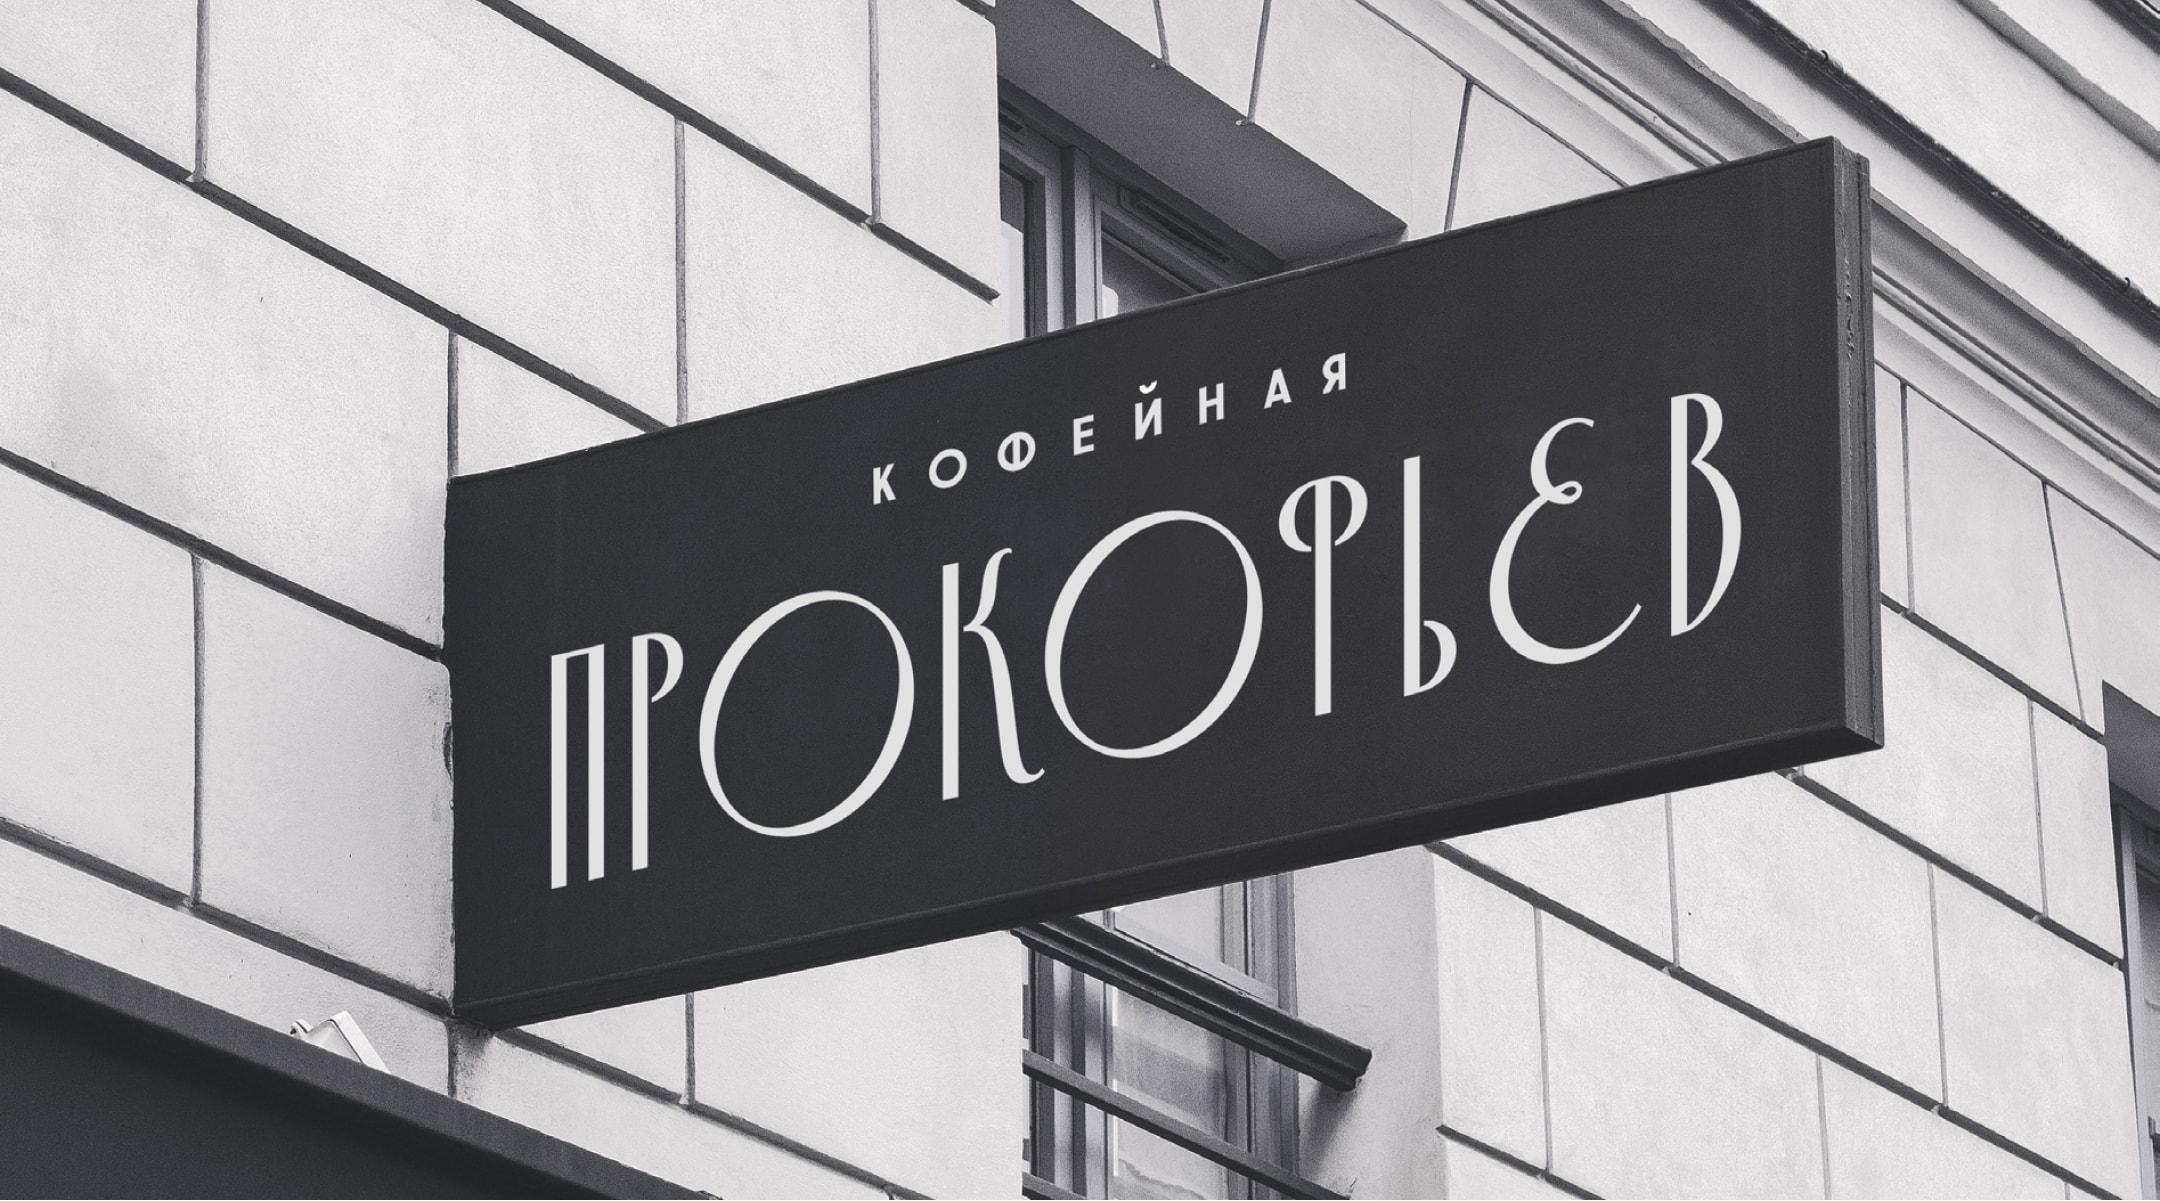 prokofiev_01-3